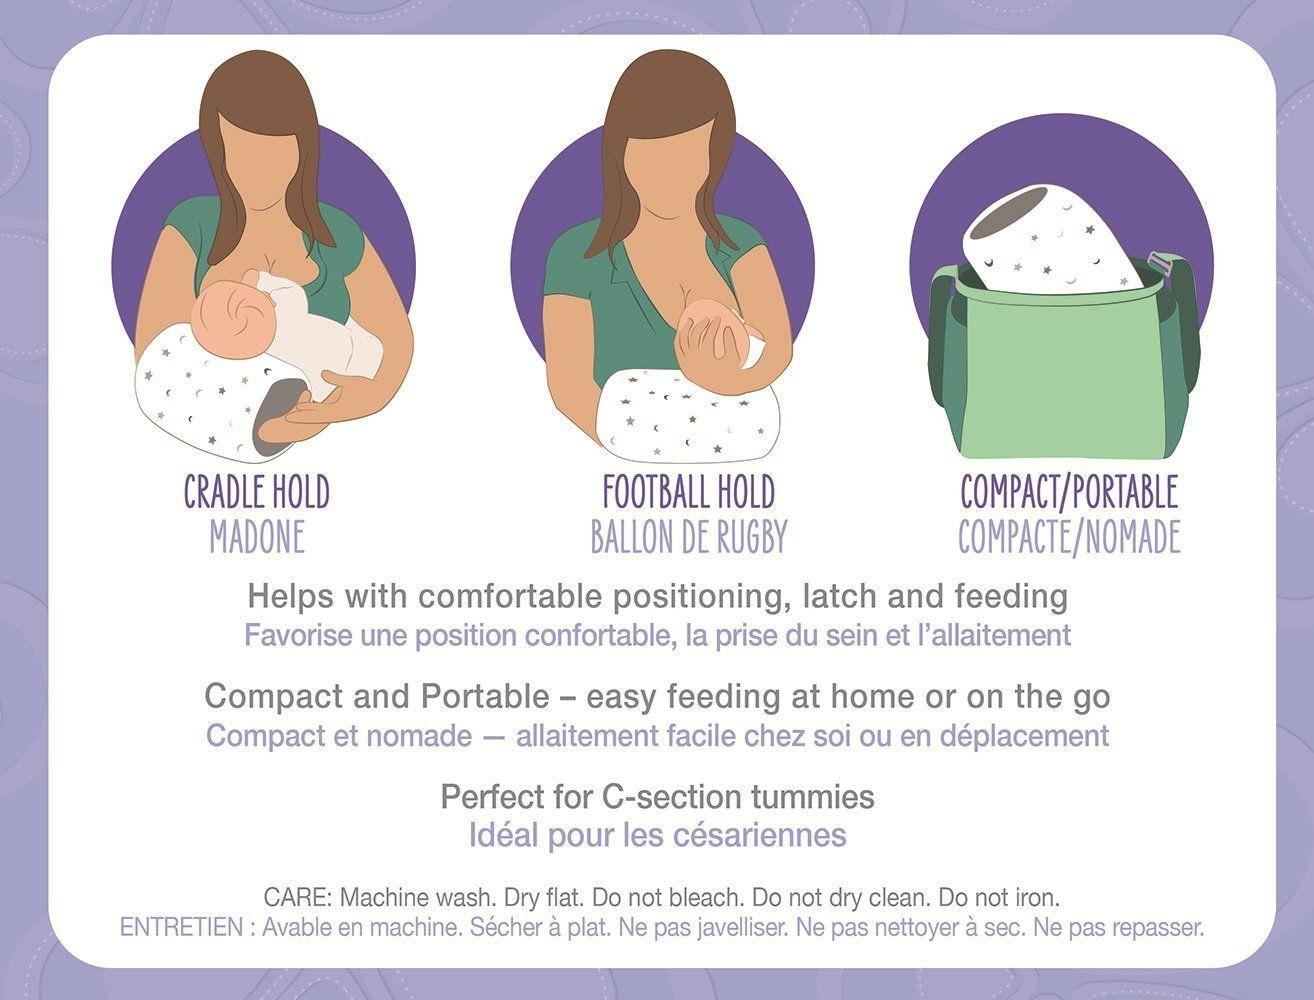 breastfeeding pillow information